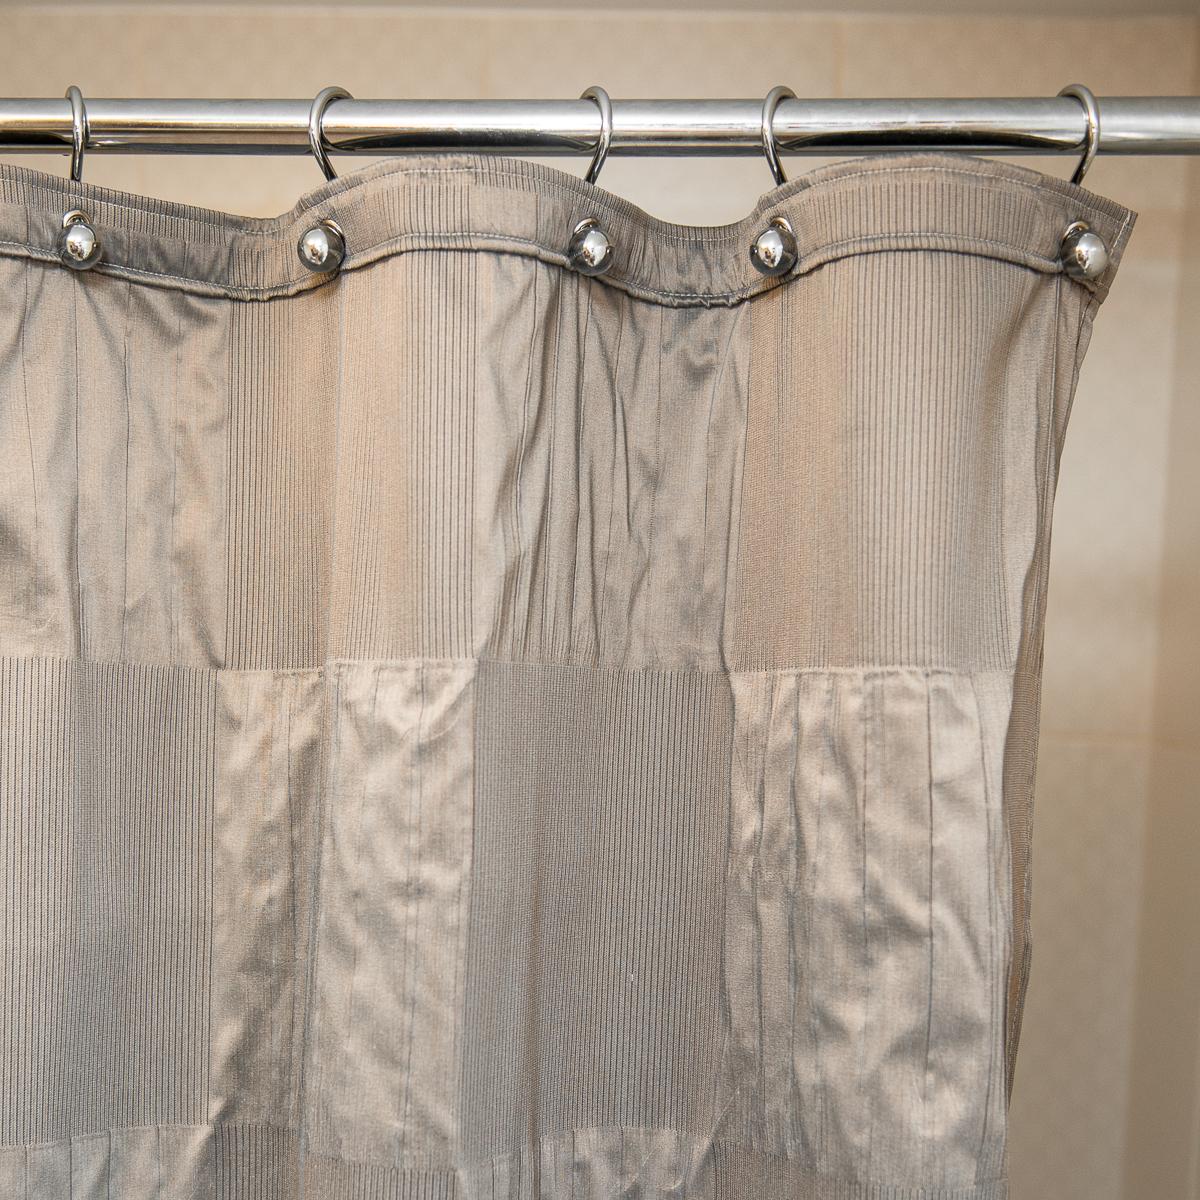 Шторки для ванной Шторка для ванной 200х240 Arti-Deco Cairo Blance + Liso White elitnaya-shtorka-dlya-vannoy-200-240-cairo-blance-ot-arti-deco-ispaniya.jpg